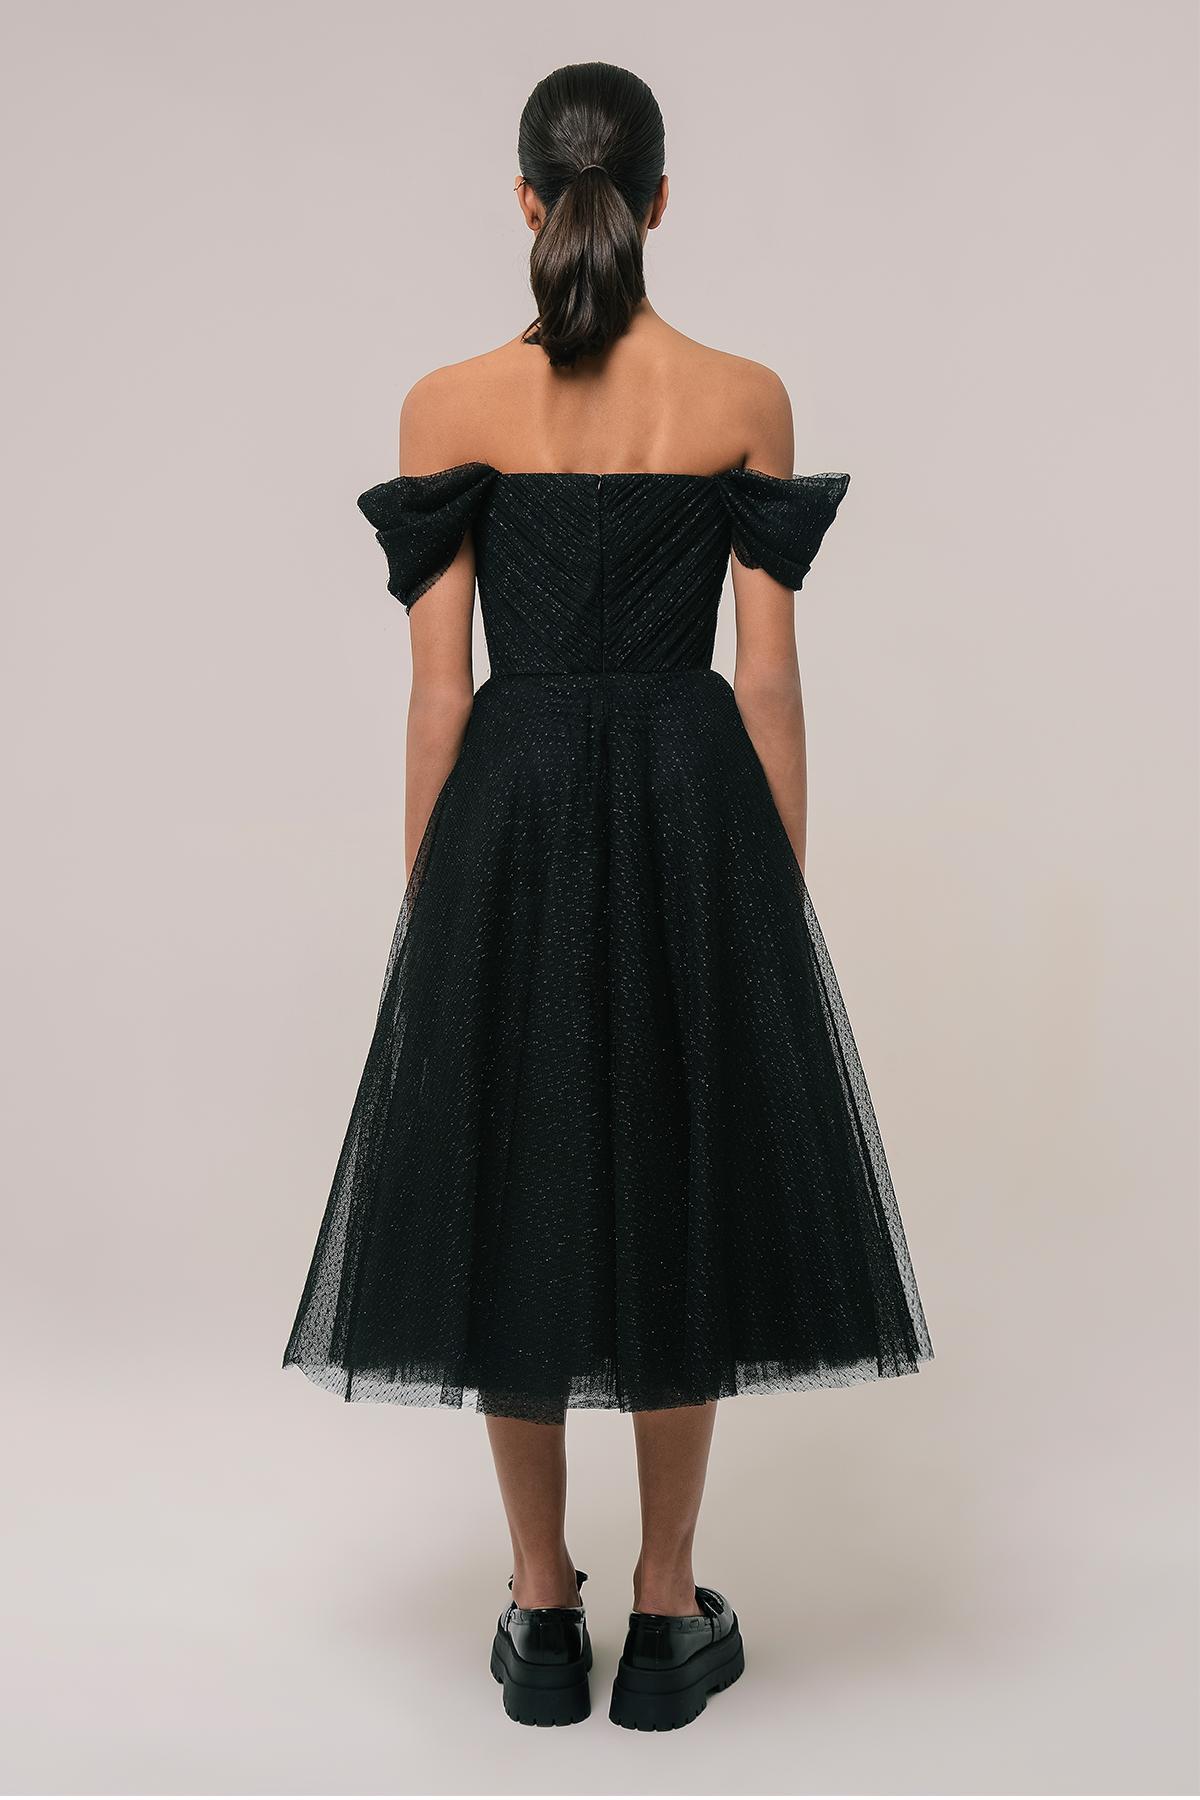 Corset style tulle dress 2